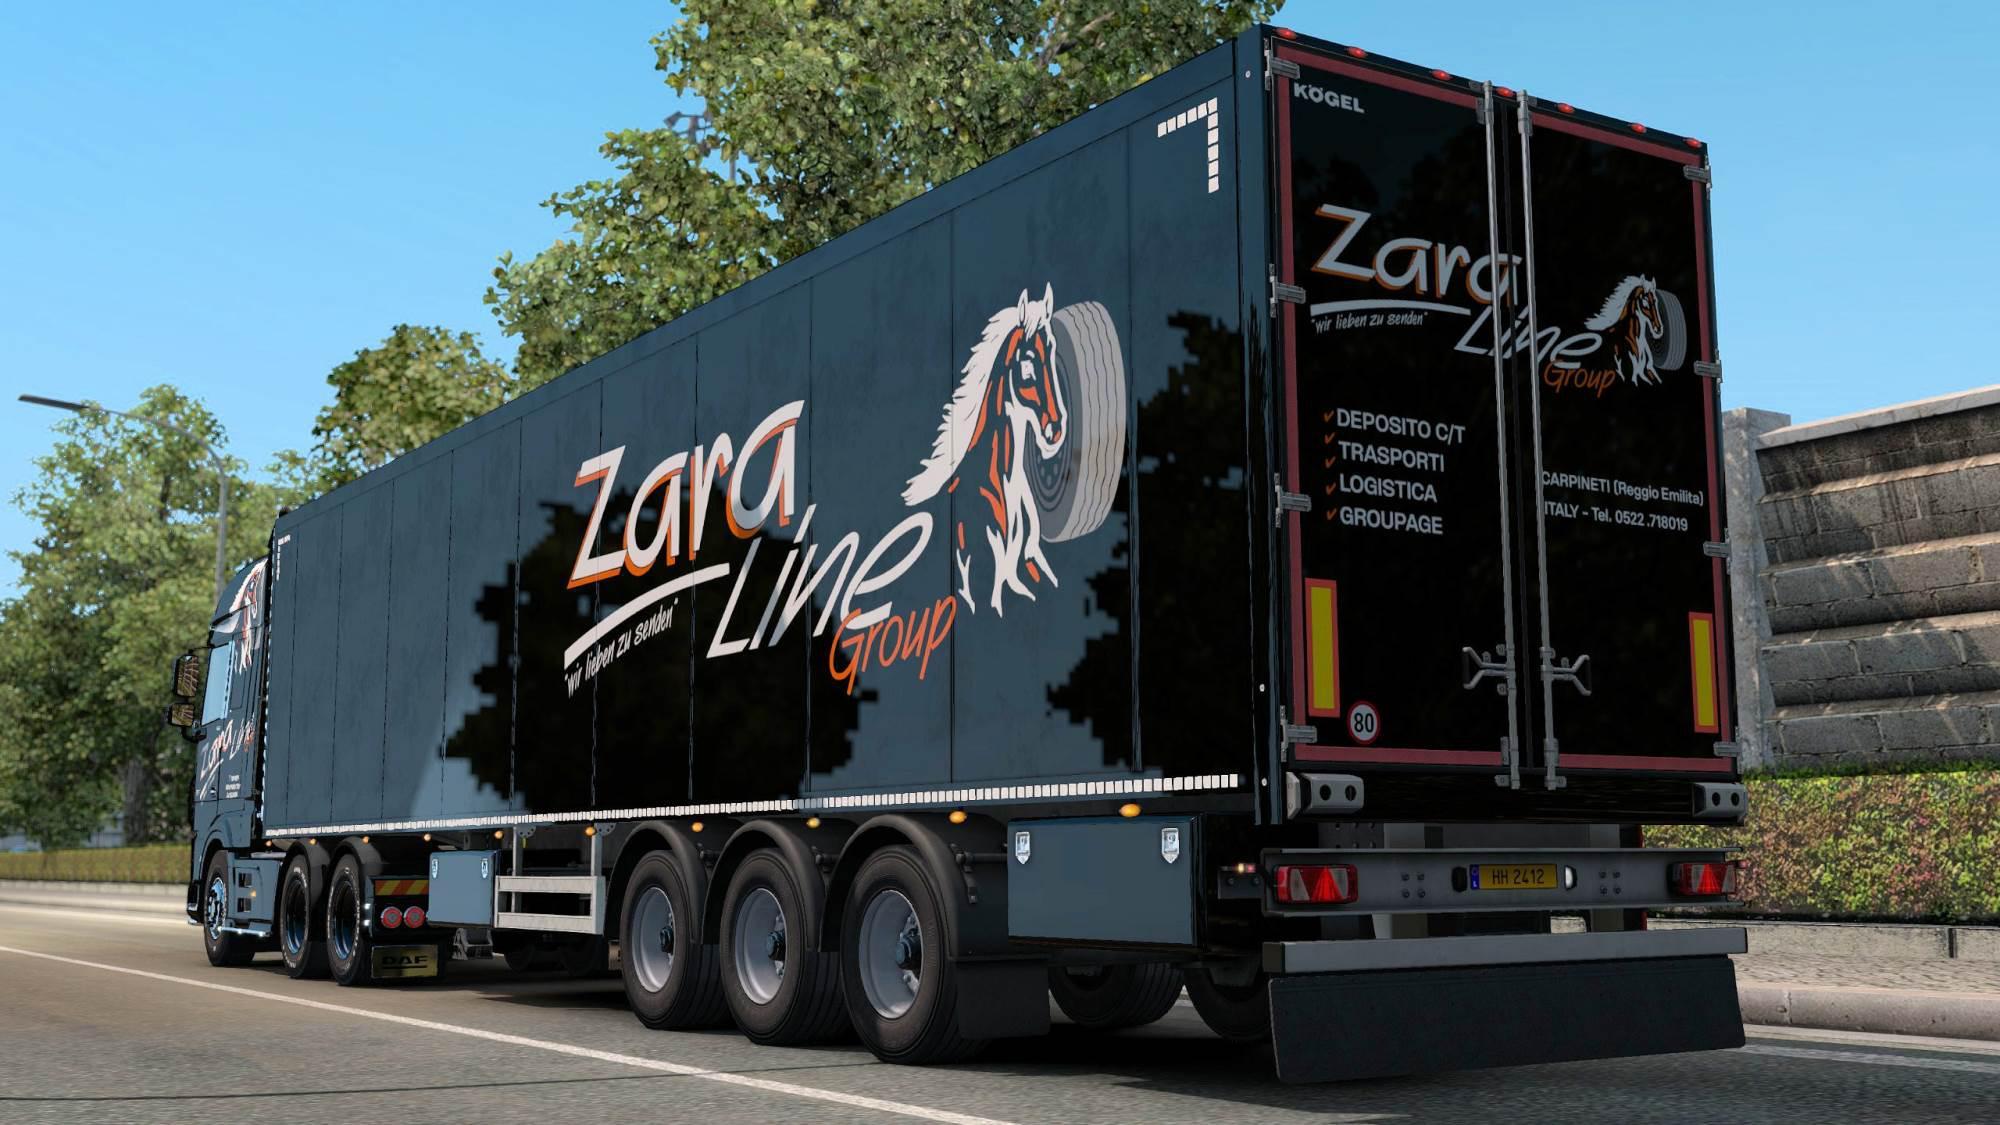 ETS2 - Zara Line Truck & Trailer Skin V1.0 (1.36.x)